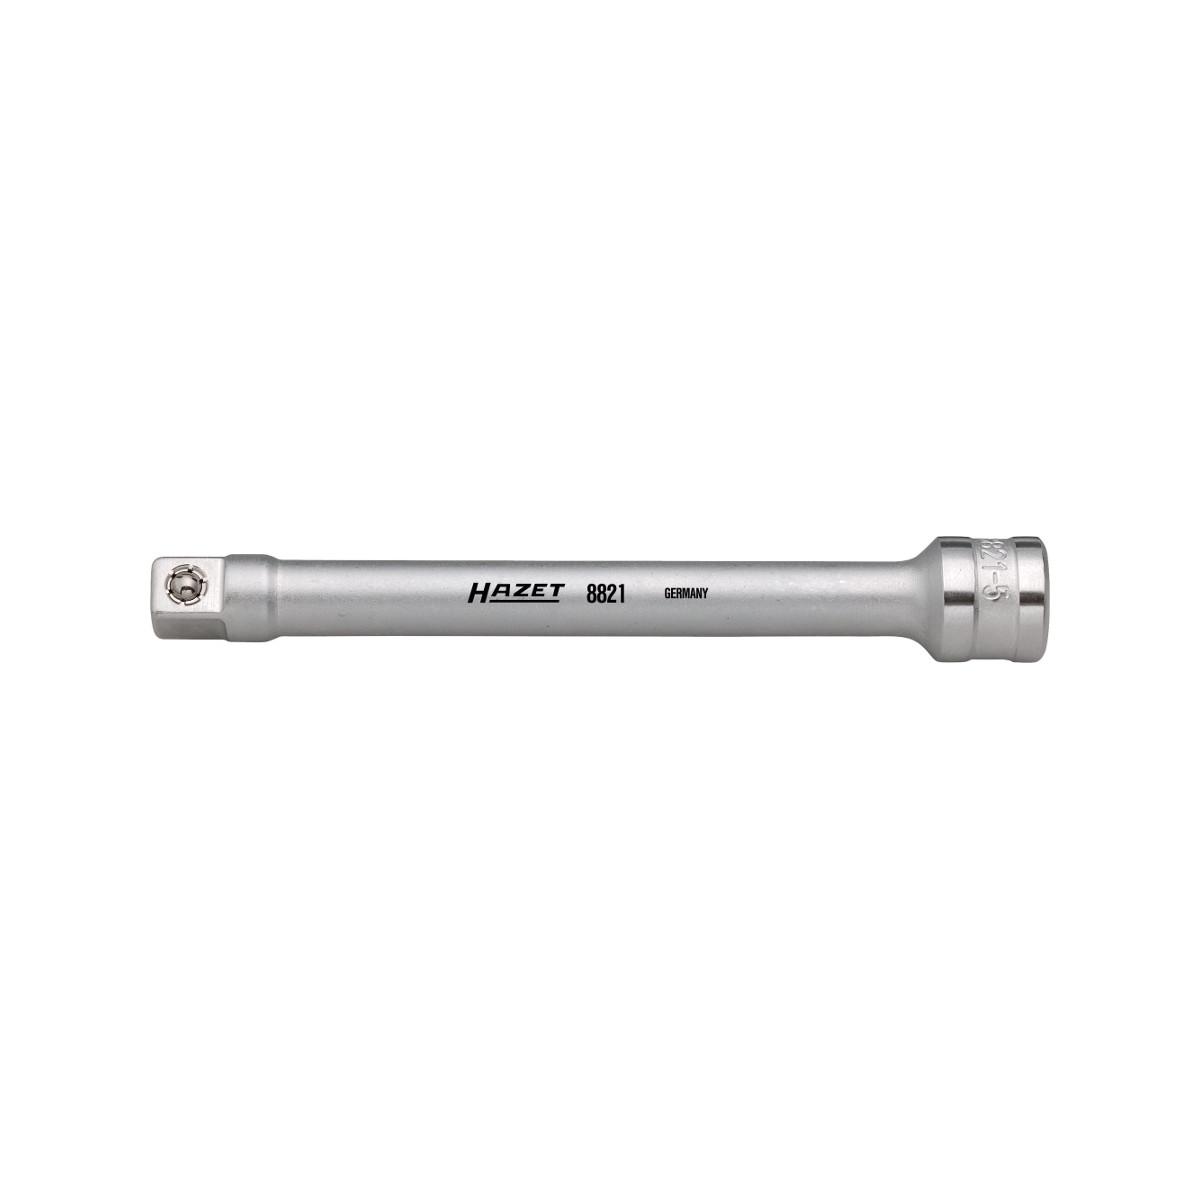 HAZET 8821-3 Extension, 74.0 mm